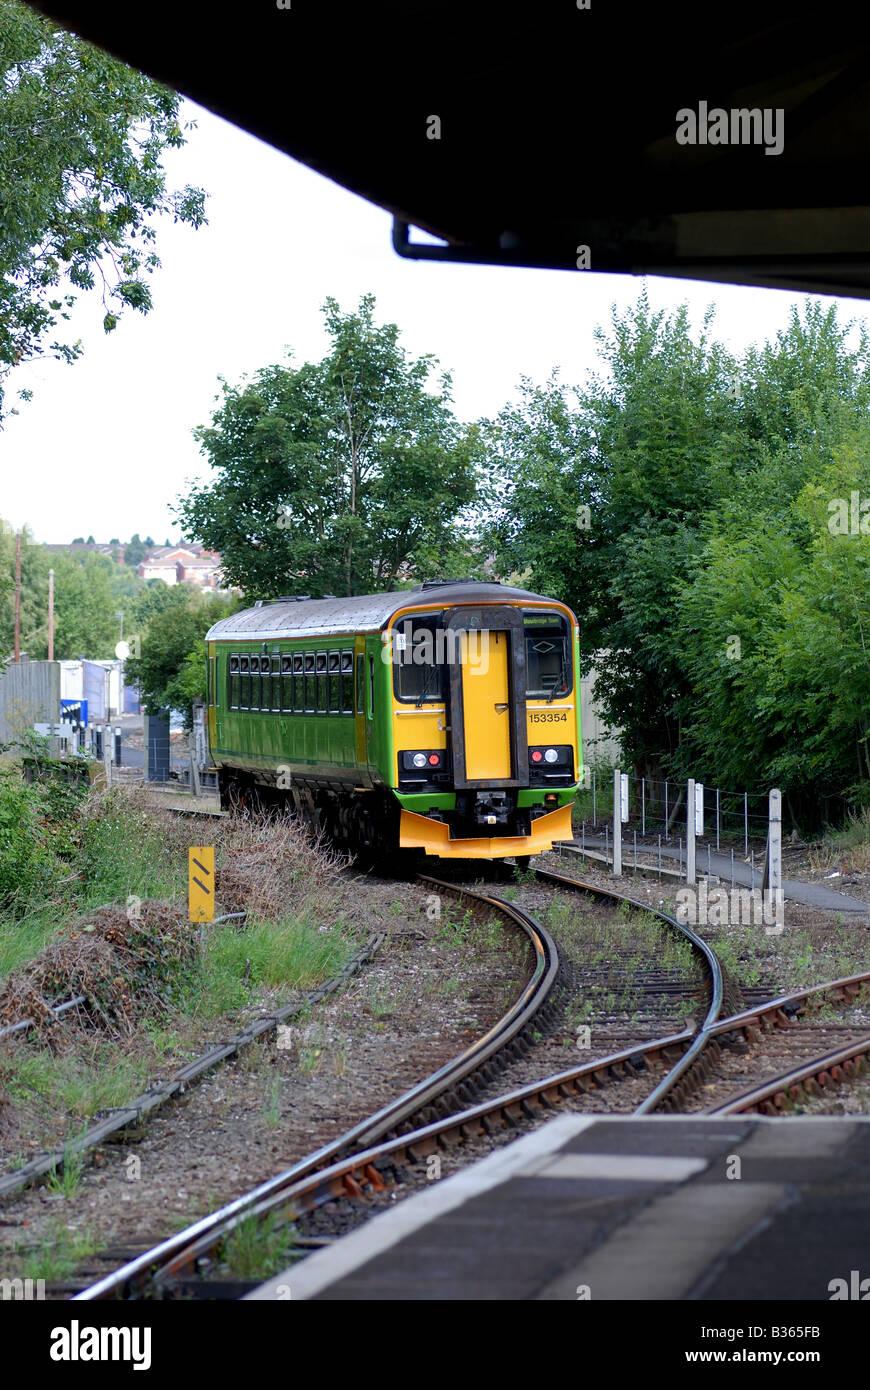 Train leaving Stourbridge Junction station for Stourbridge Town, West Midlands, England, UK - Stock Image